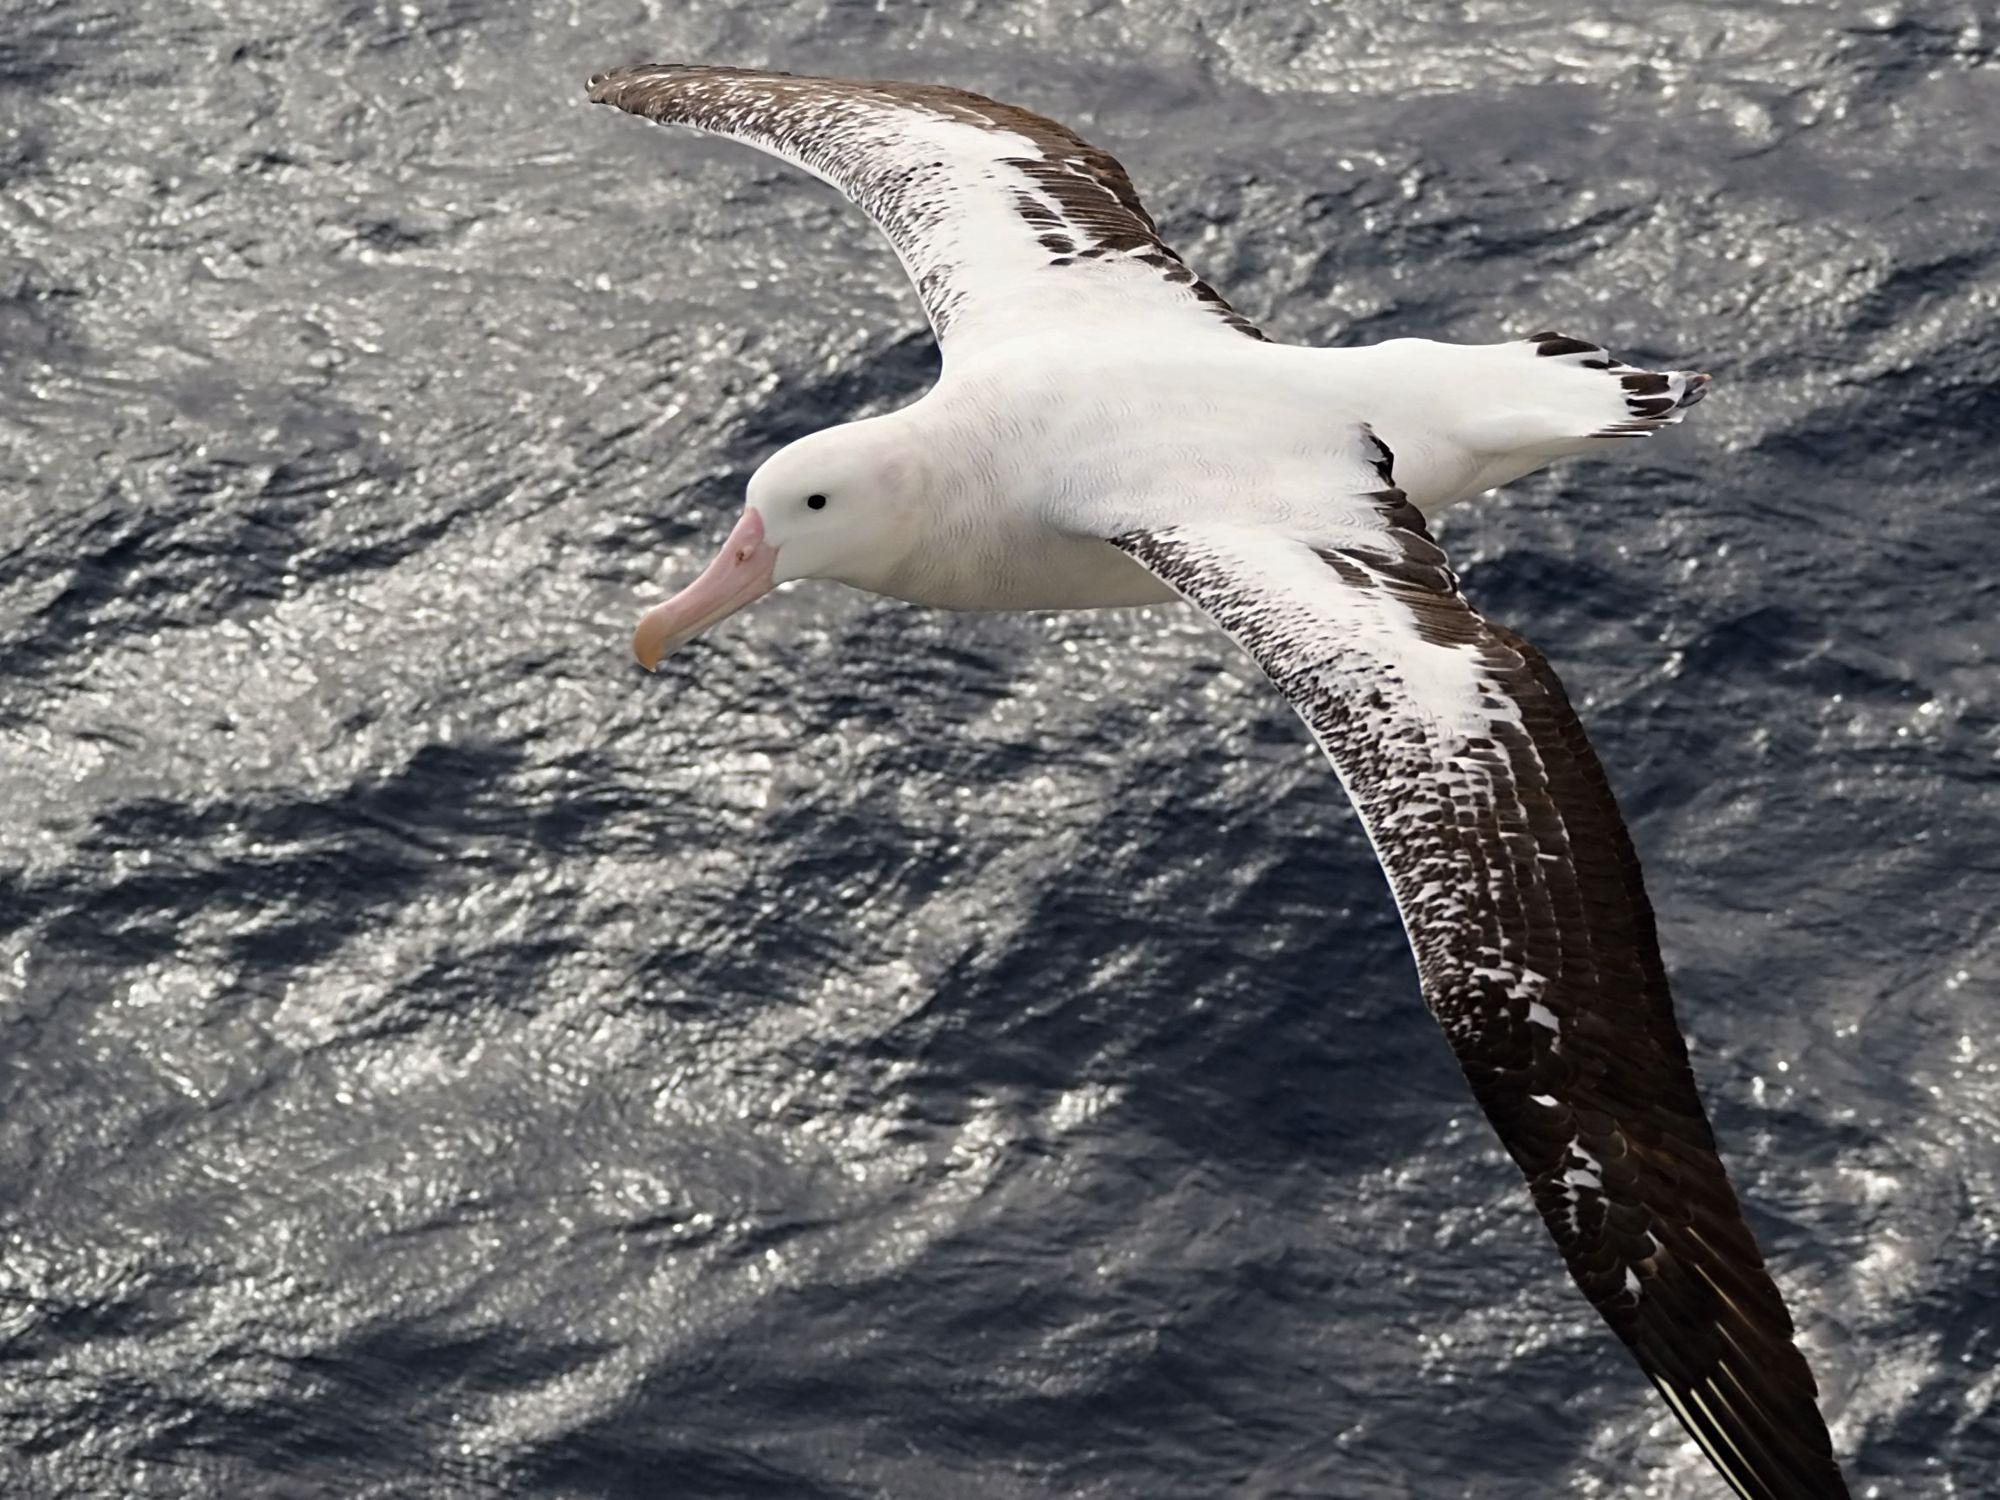 Albatross coming in for a look